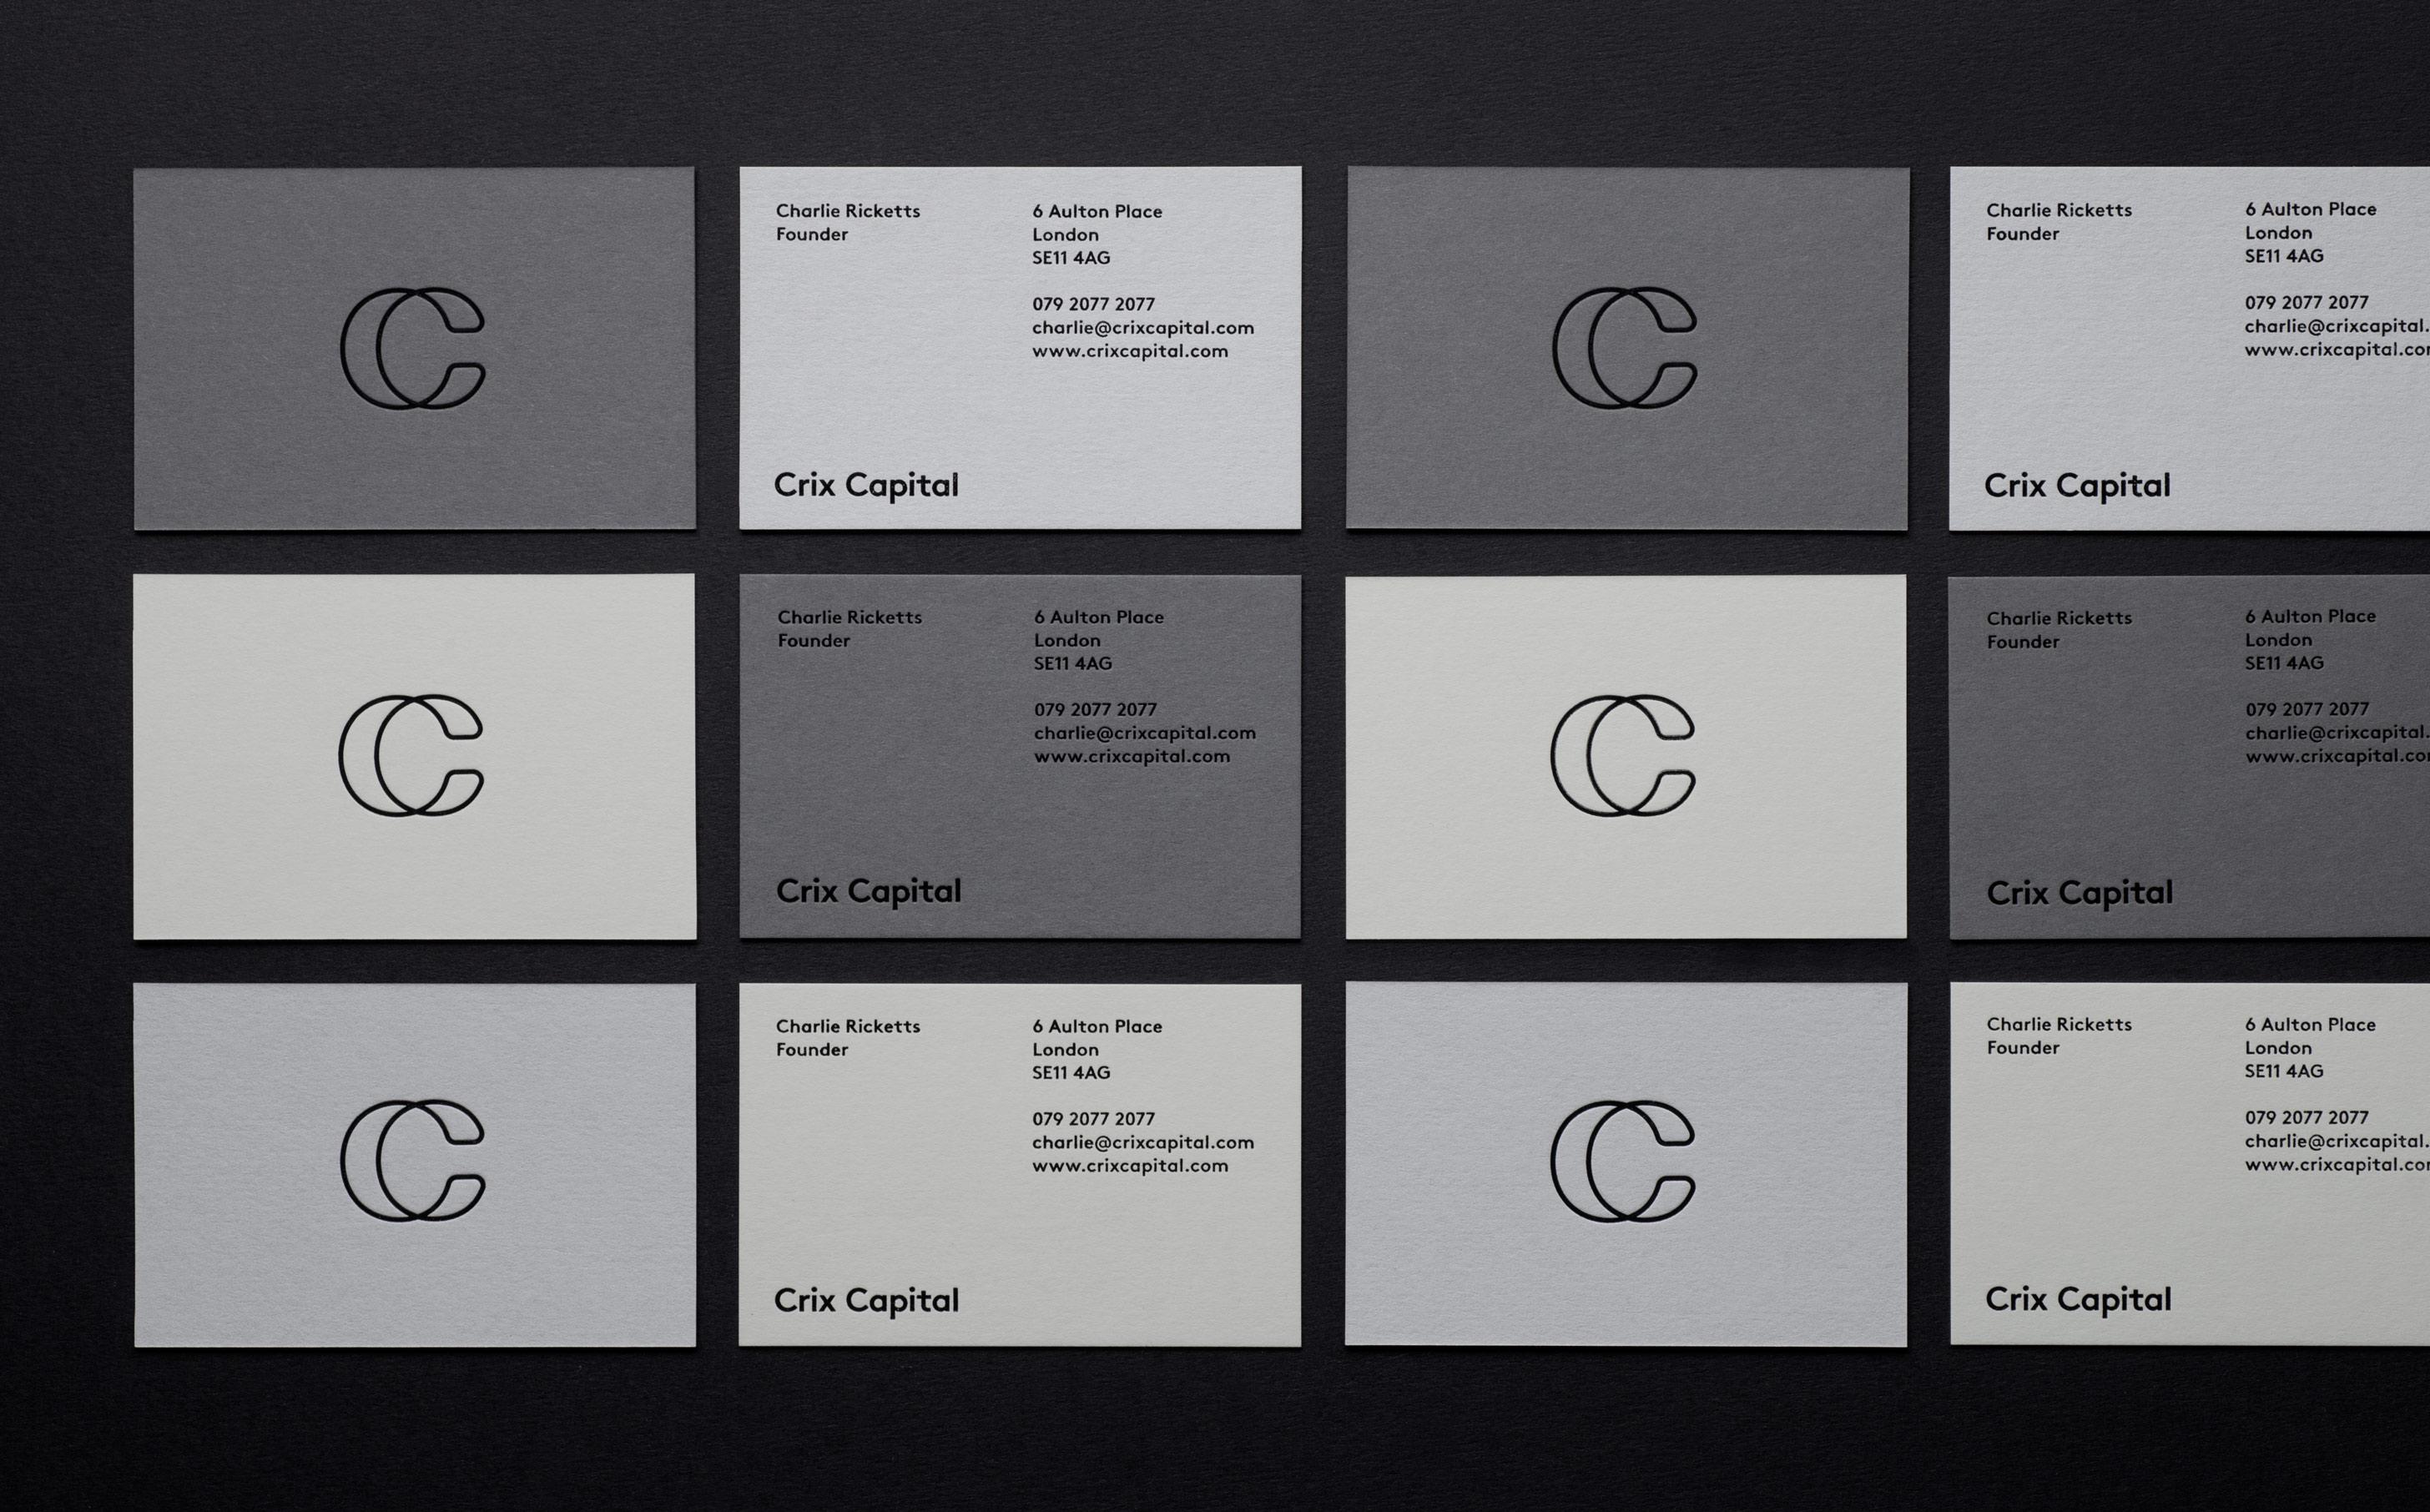 Business-card-design-crix-capital-london-02